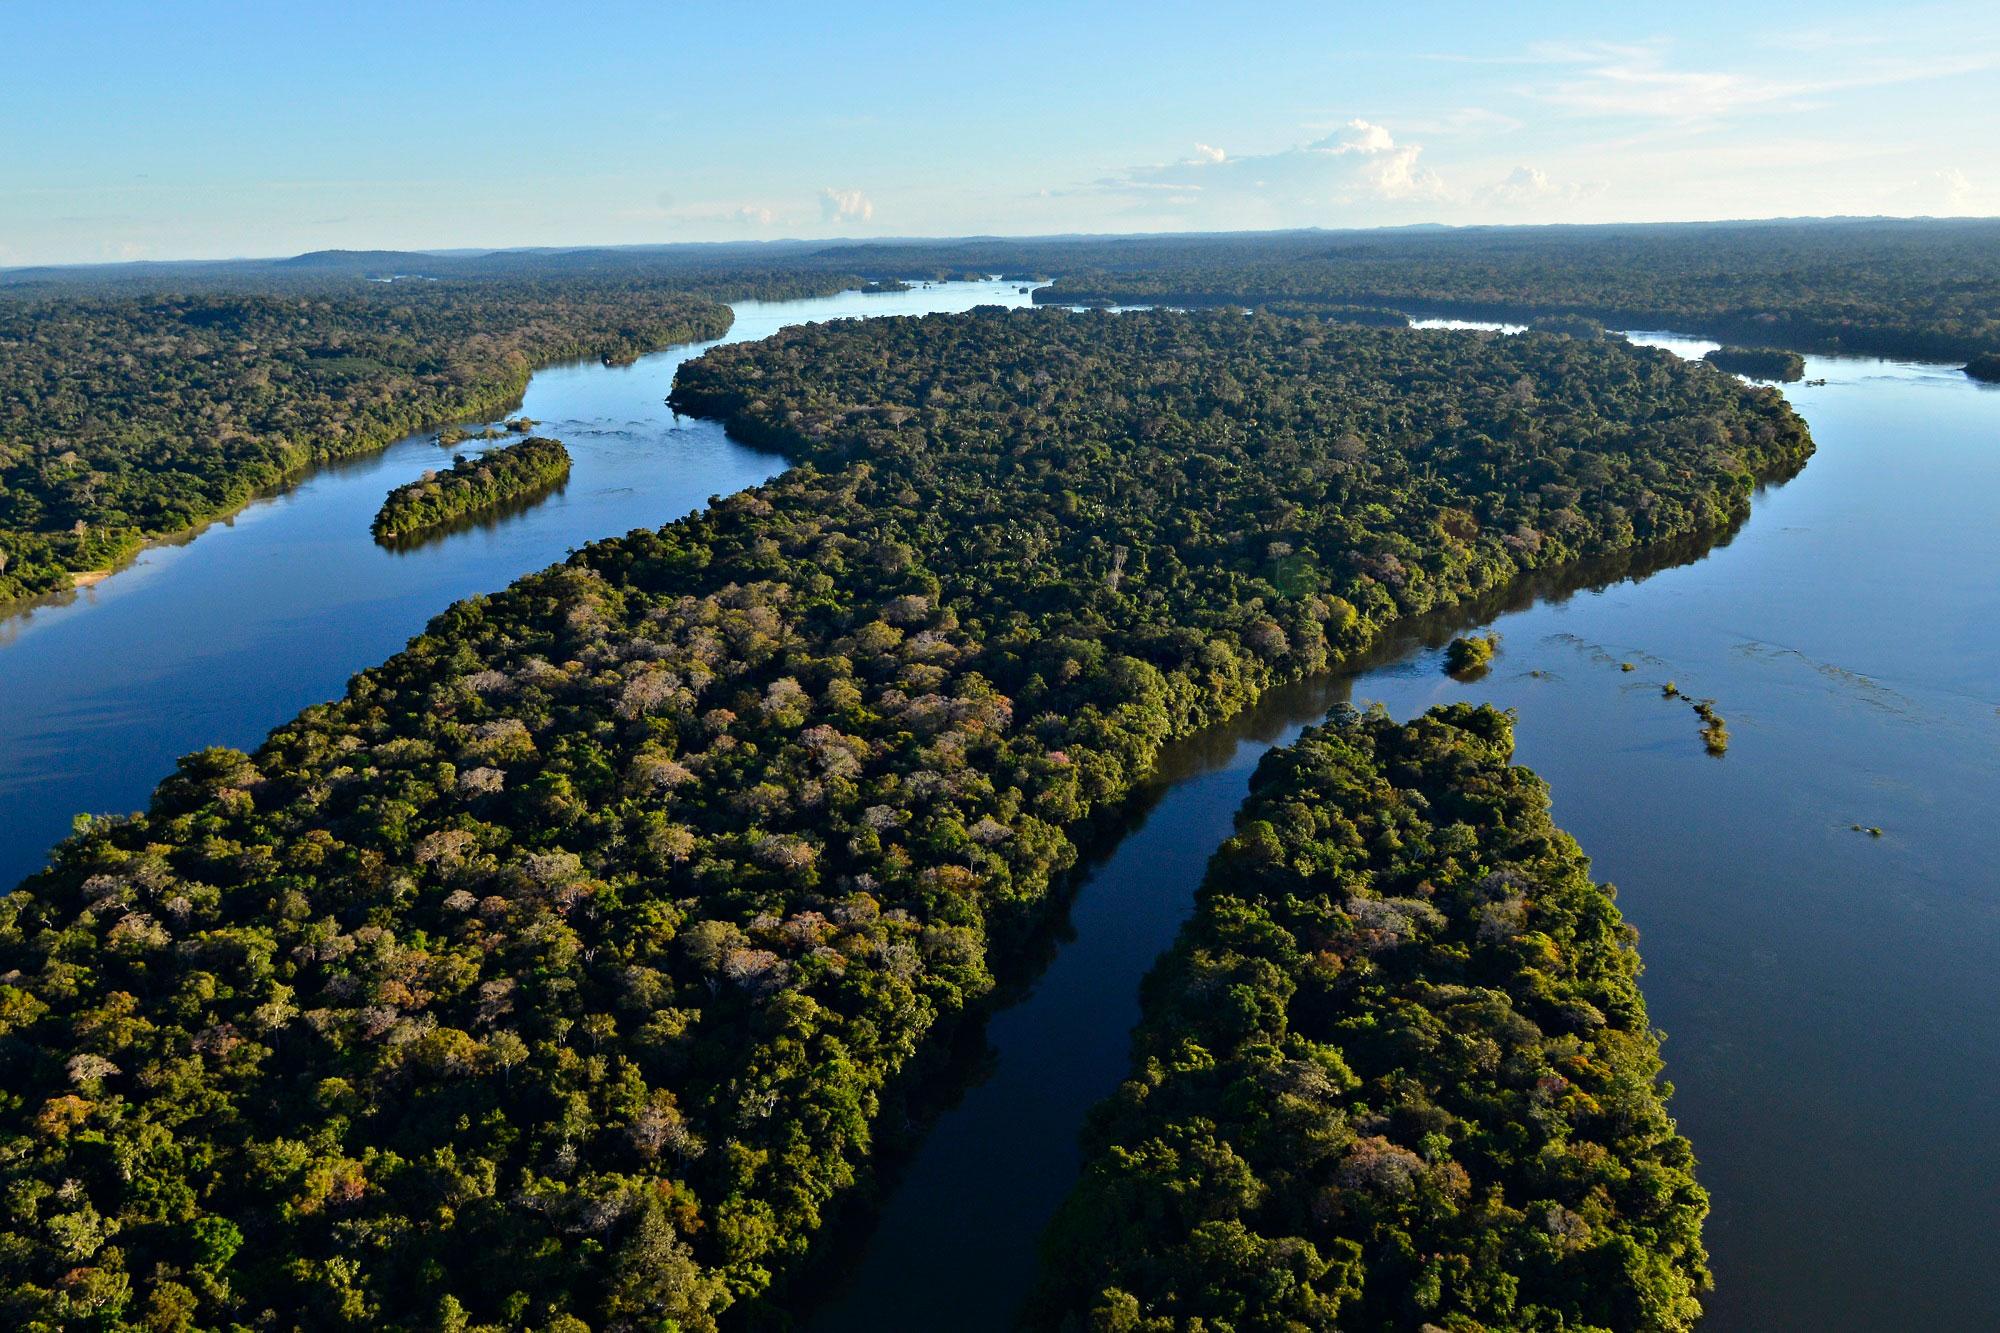 Parque-Nacional-do-Juruena Adriano-Gambarini-WWF-Brasil